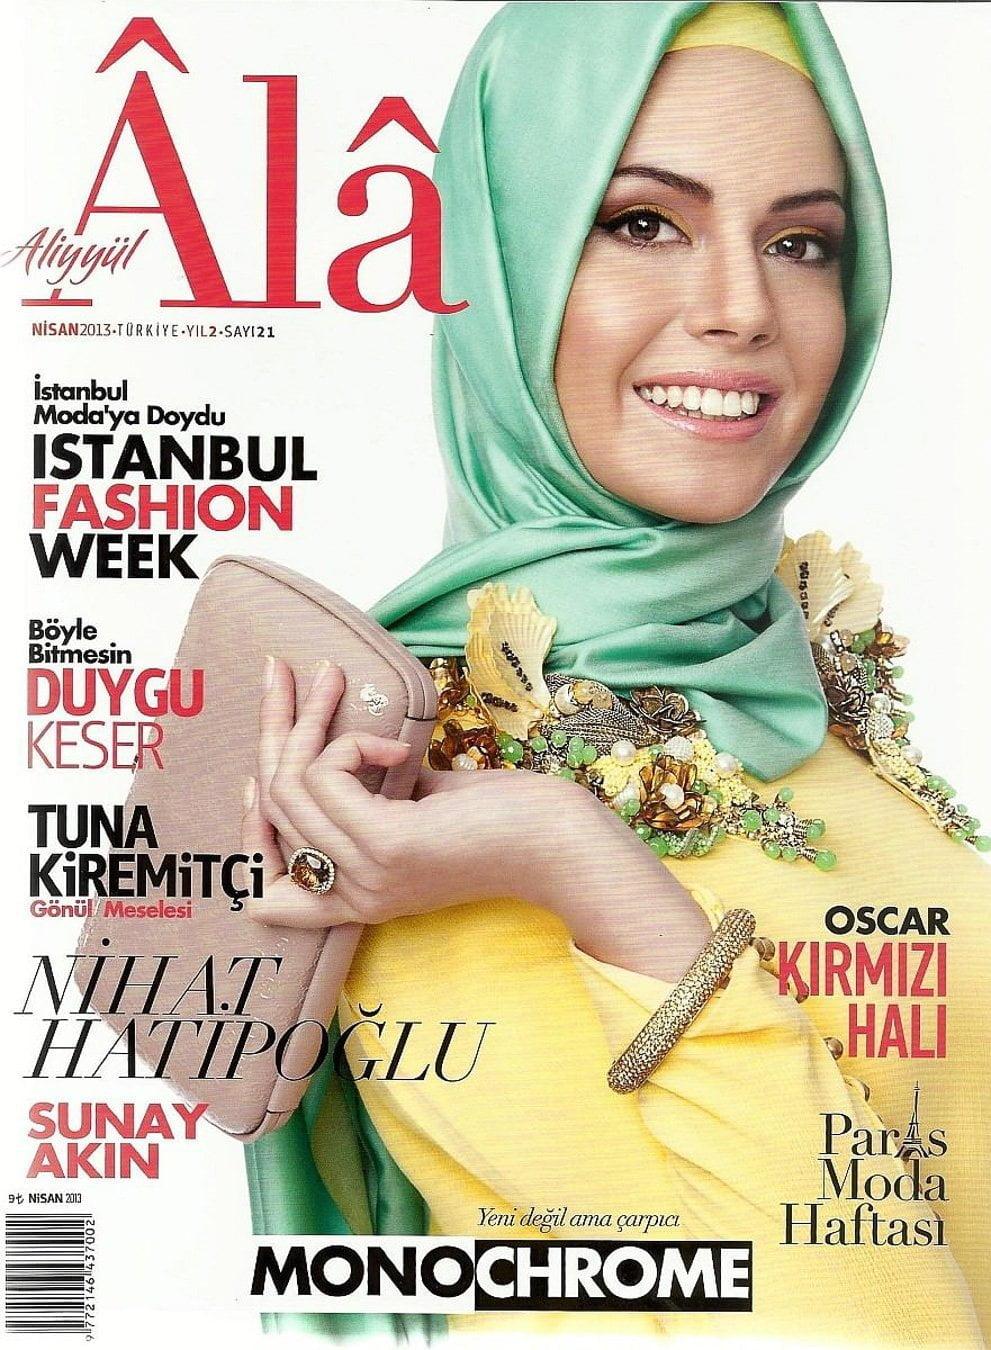 Moda Çekimi - Editorial - Beauty moda tekstil burakbulutfotografatolyesi 2